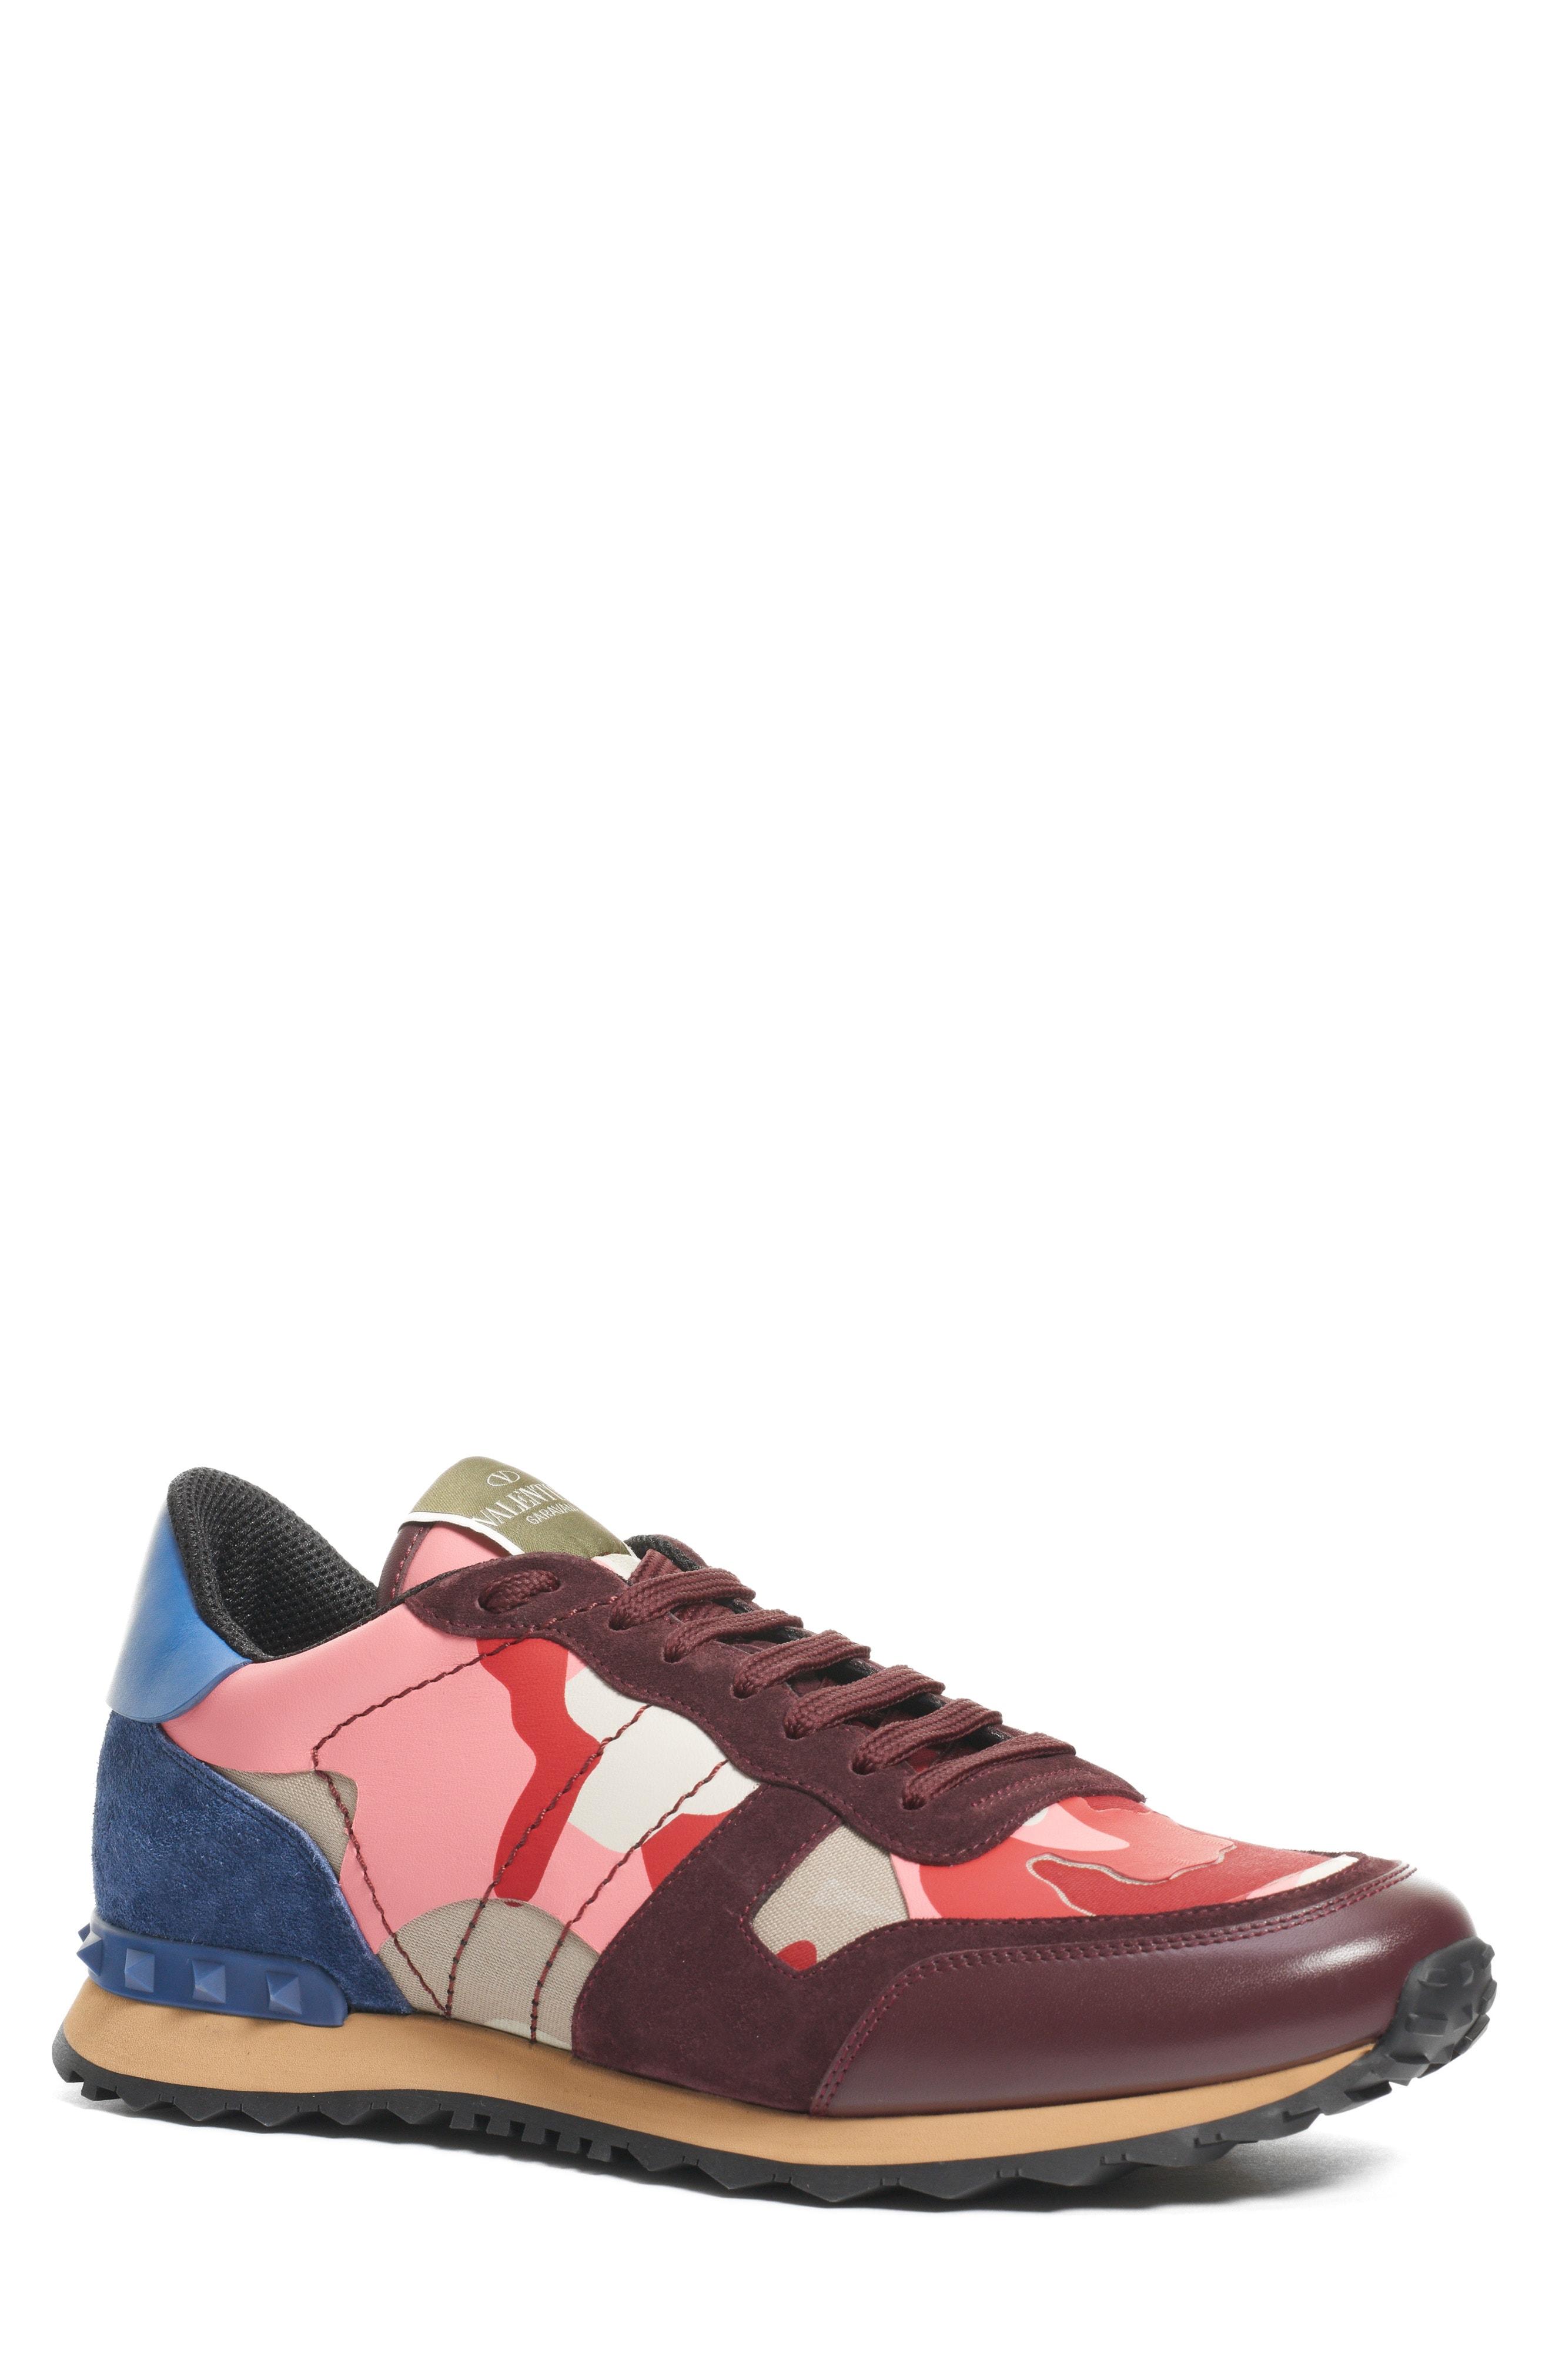 945a389ff125f Men's Valentino Garavani Camo Rockrunner Sneaker, Size 6US / 39EU – Red